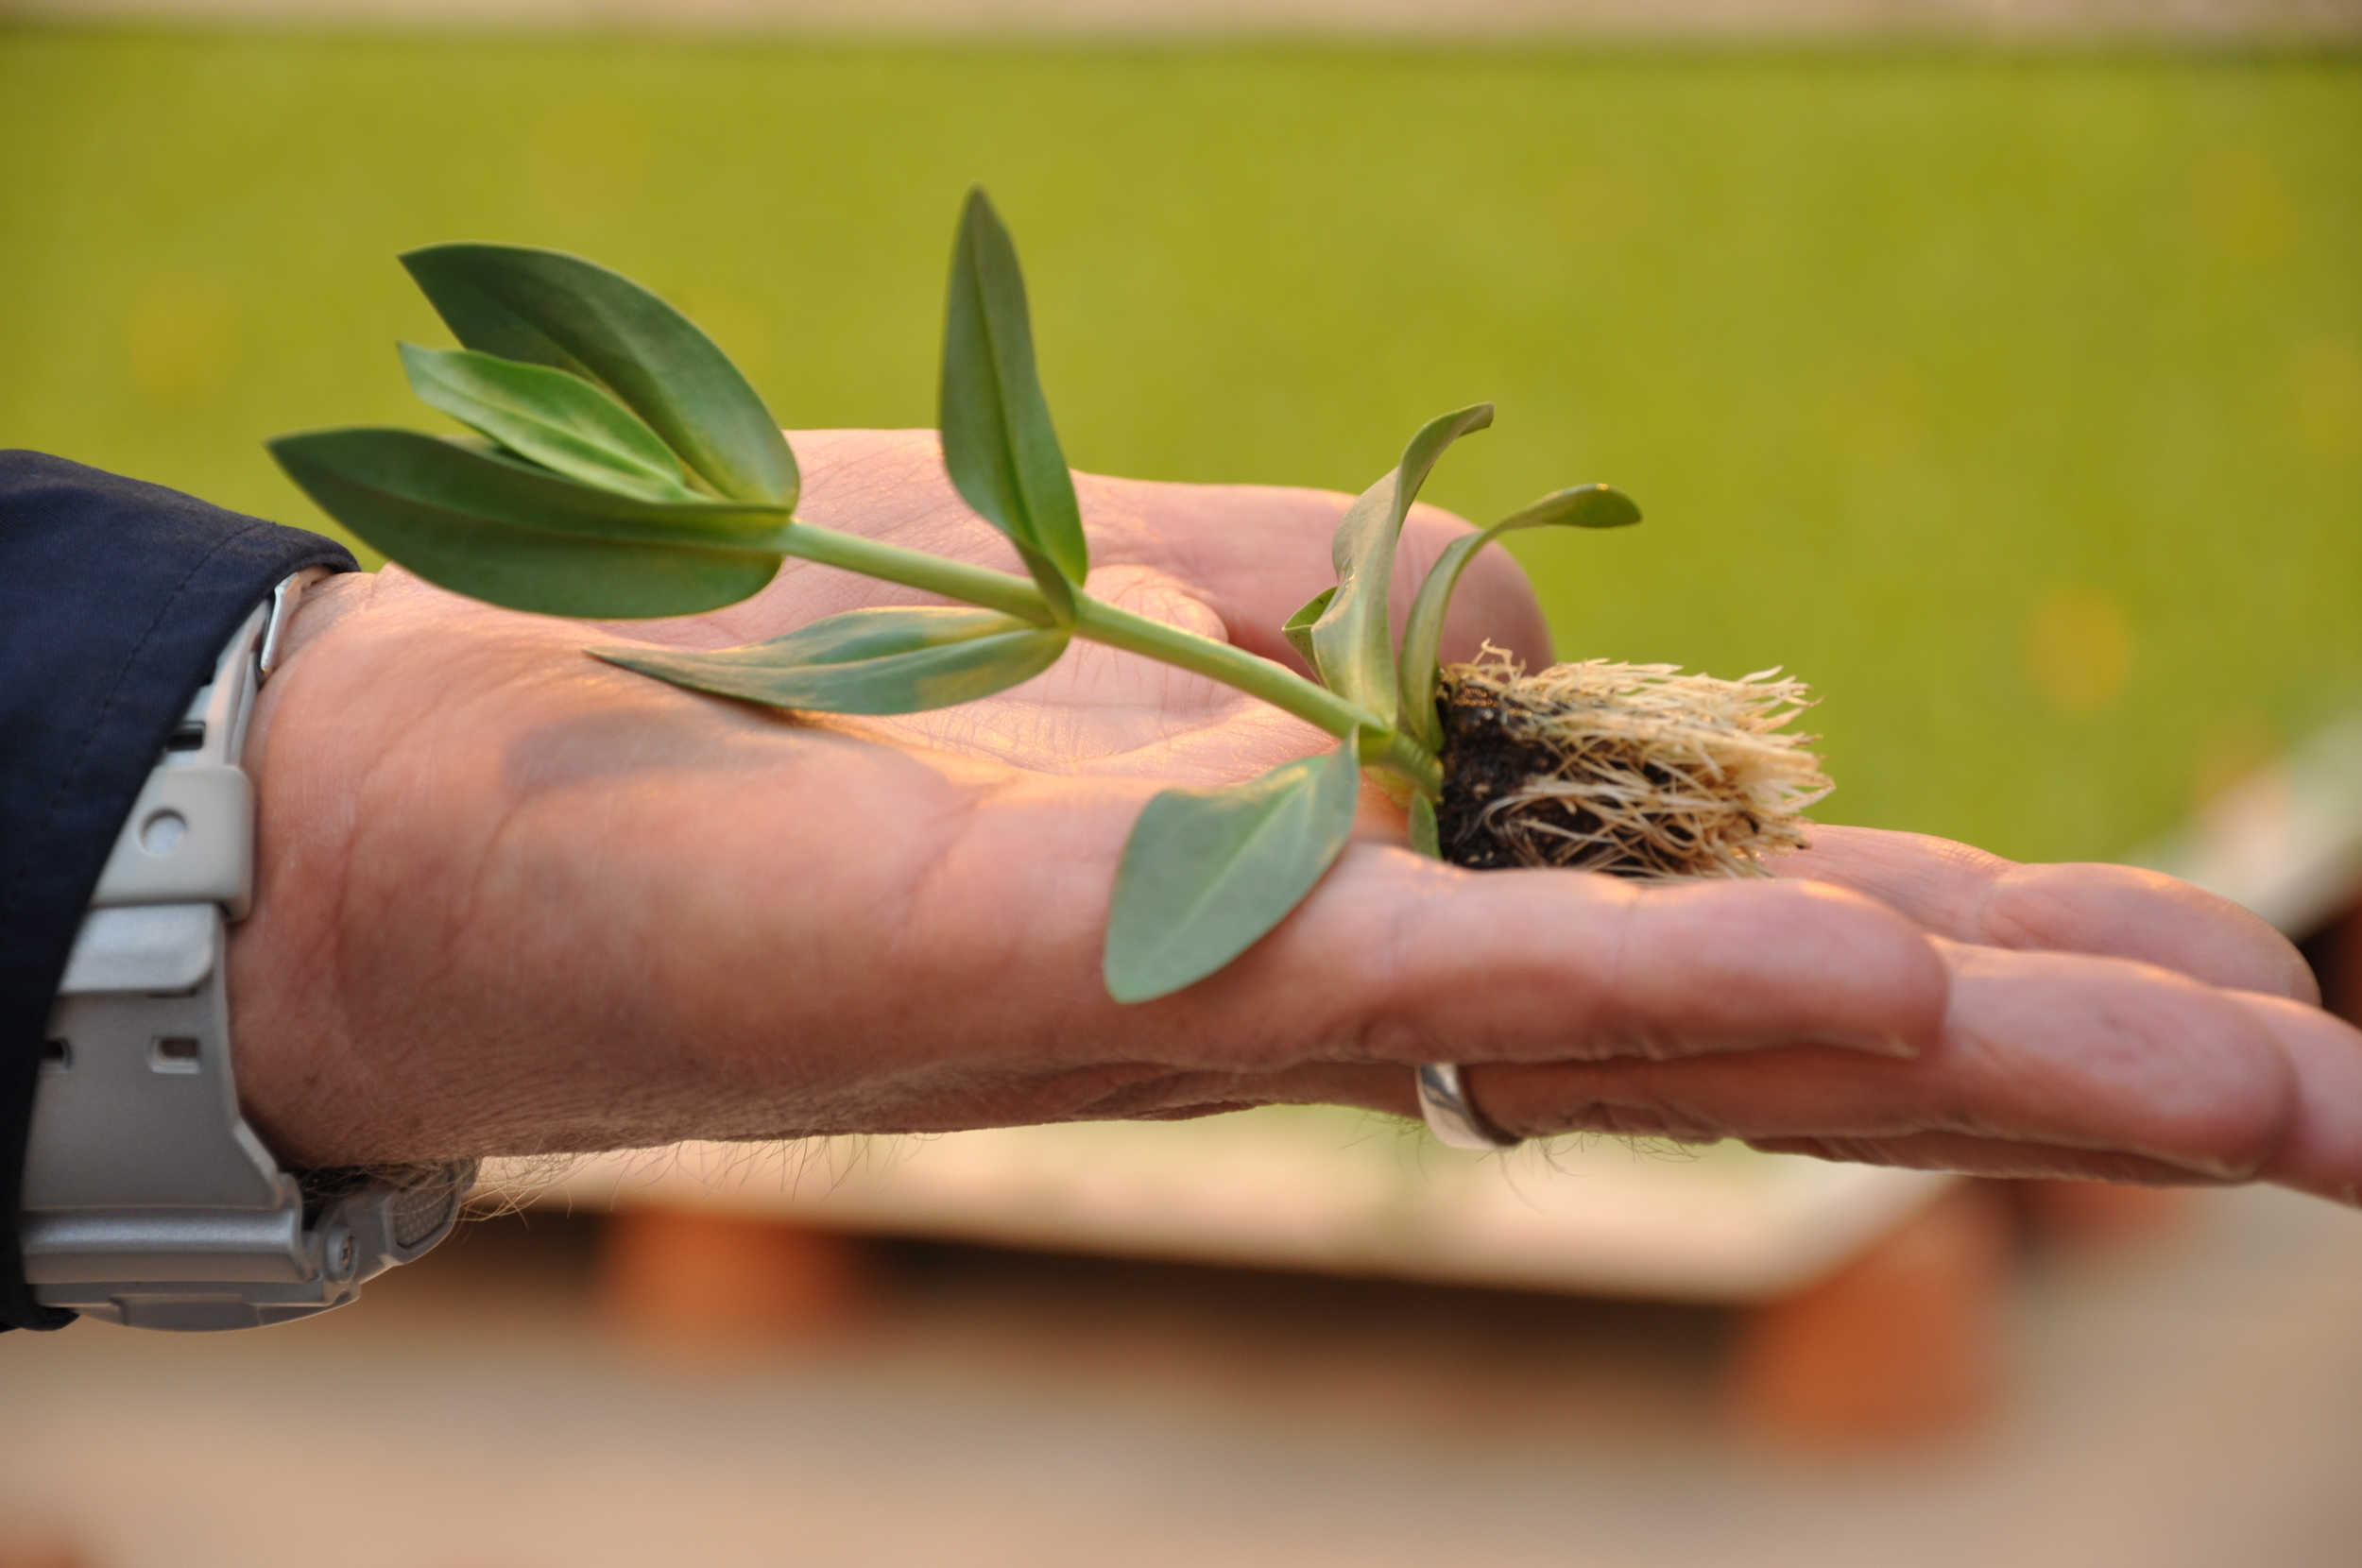 Man's hand holding plant seedling